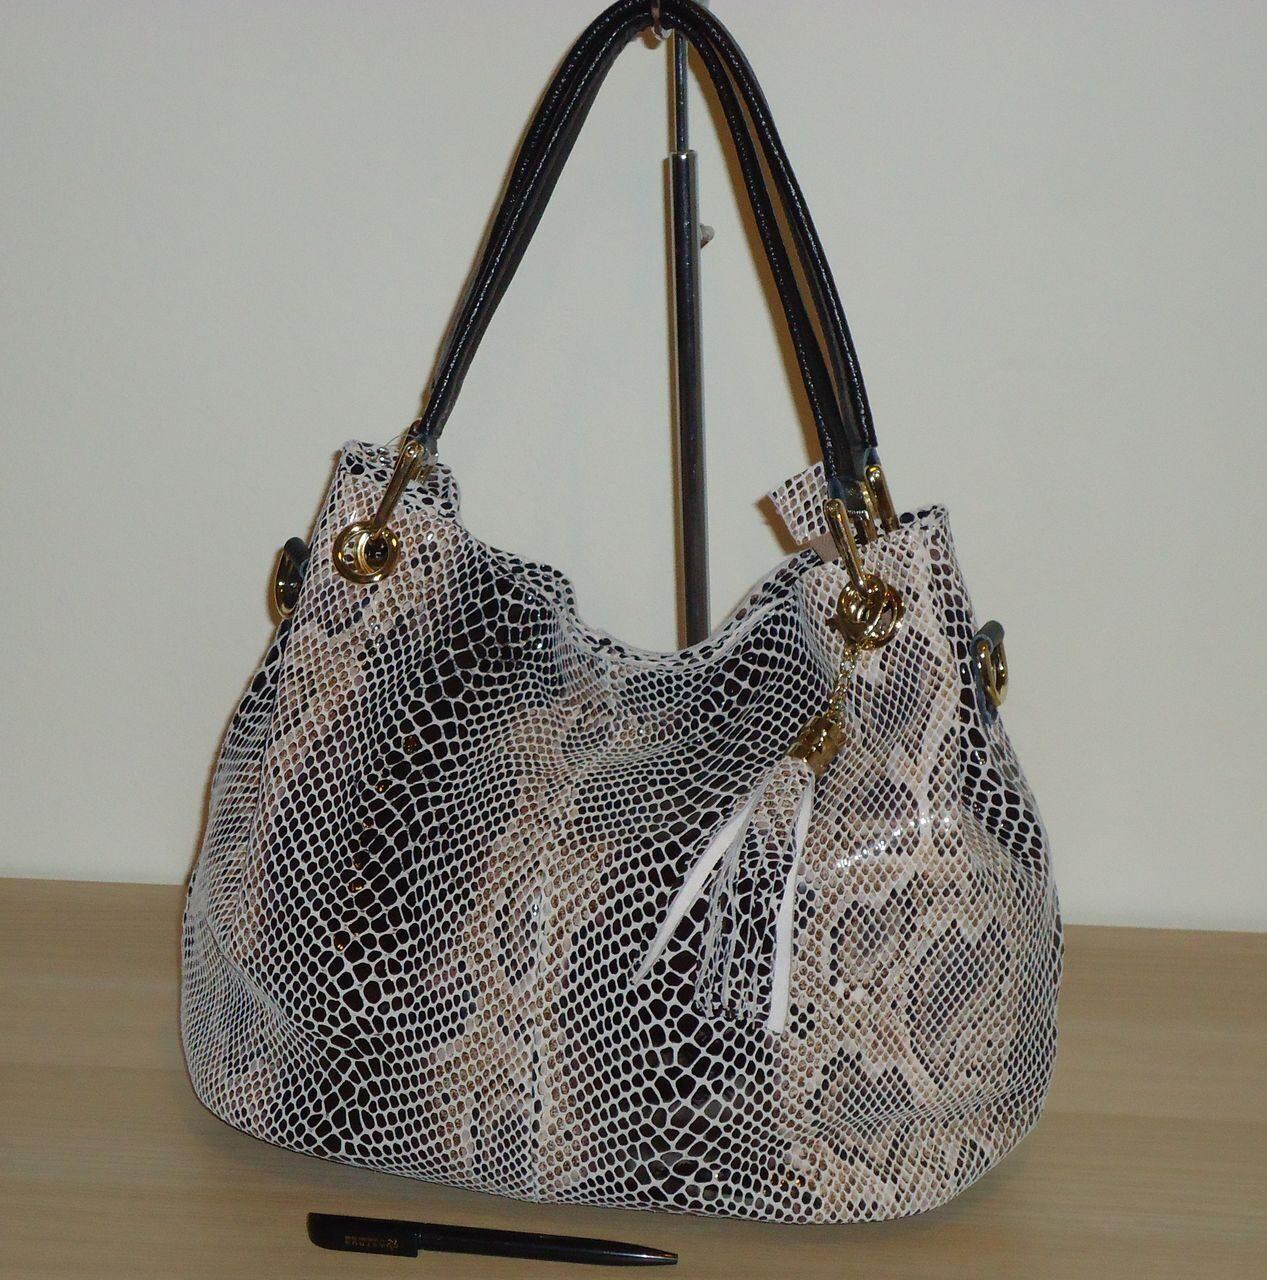 851cfa9d2894 Margolli collection Интернет-магазин женских сумок в Москве - Moda ...